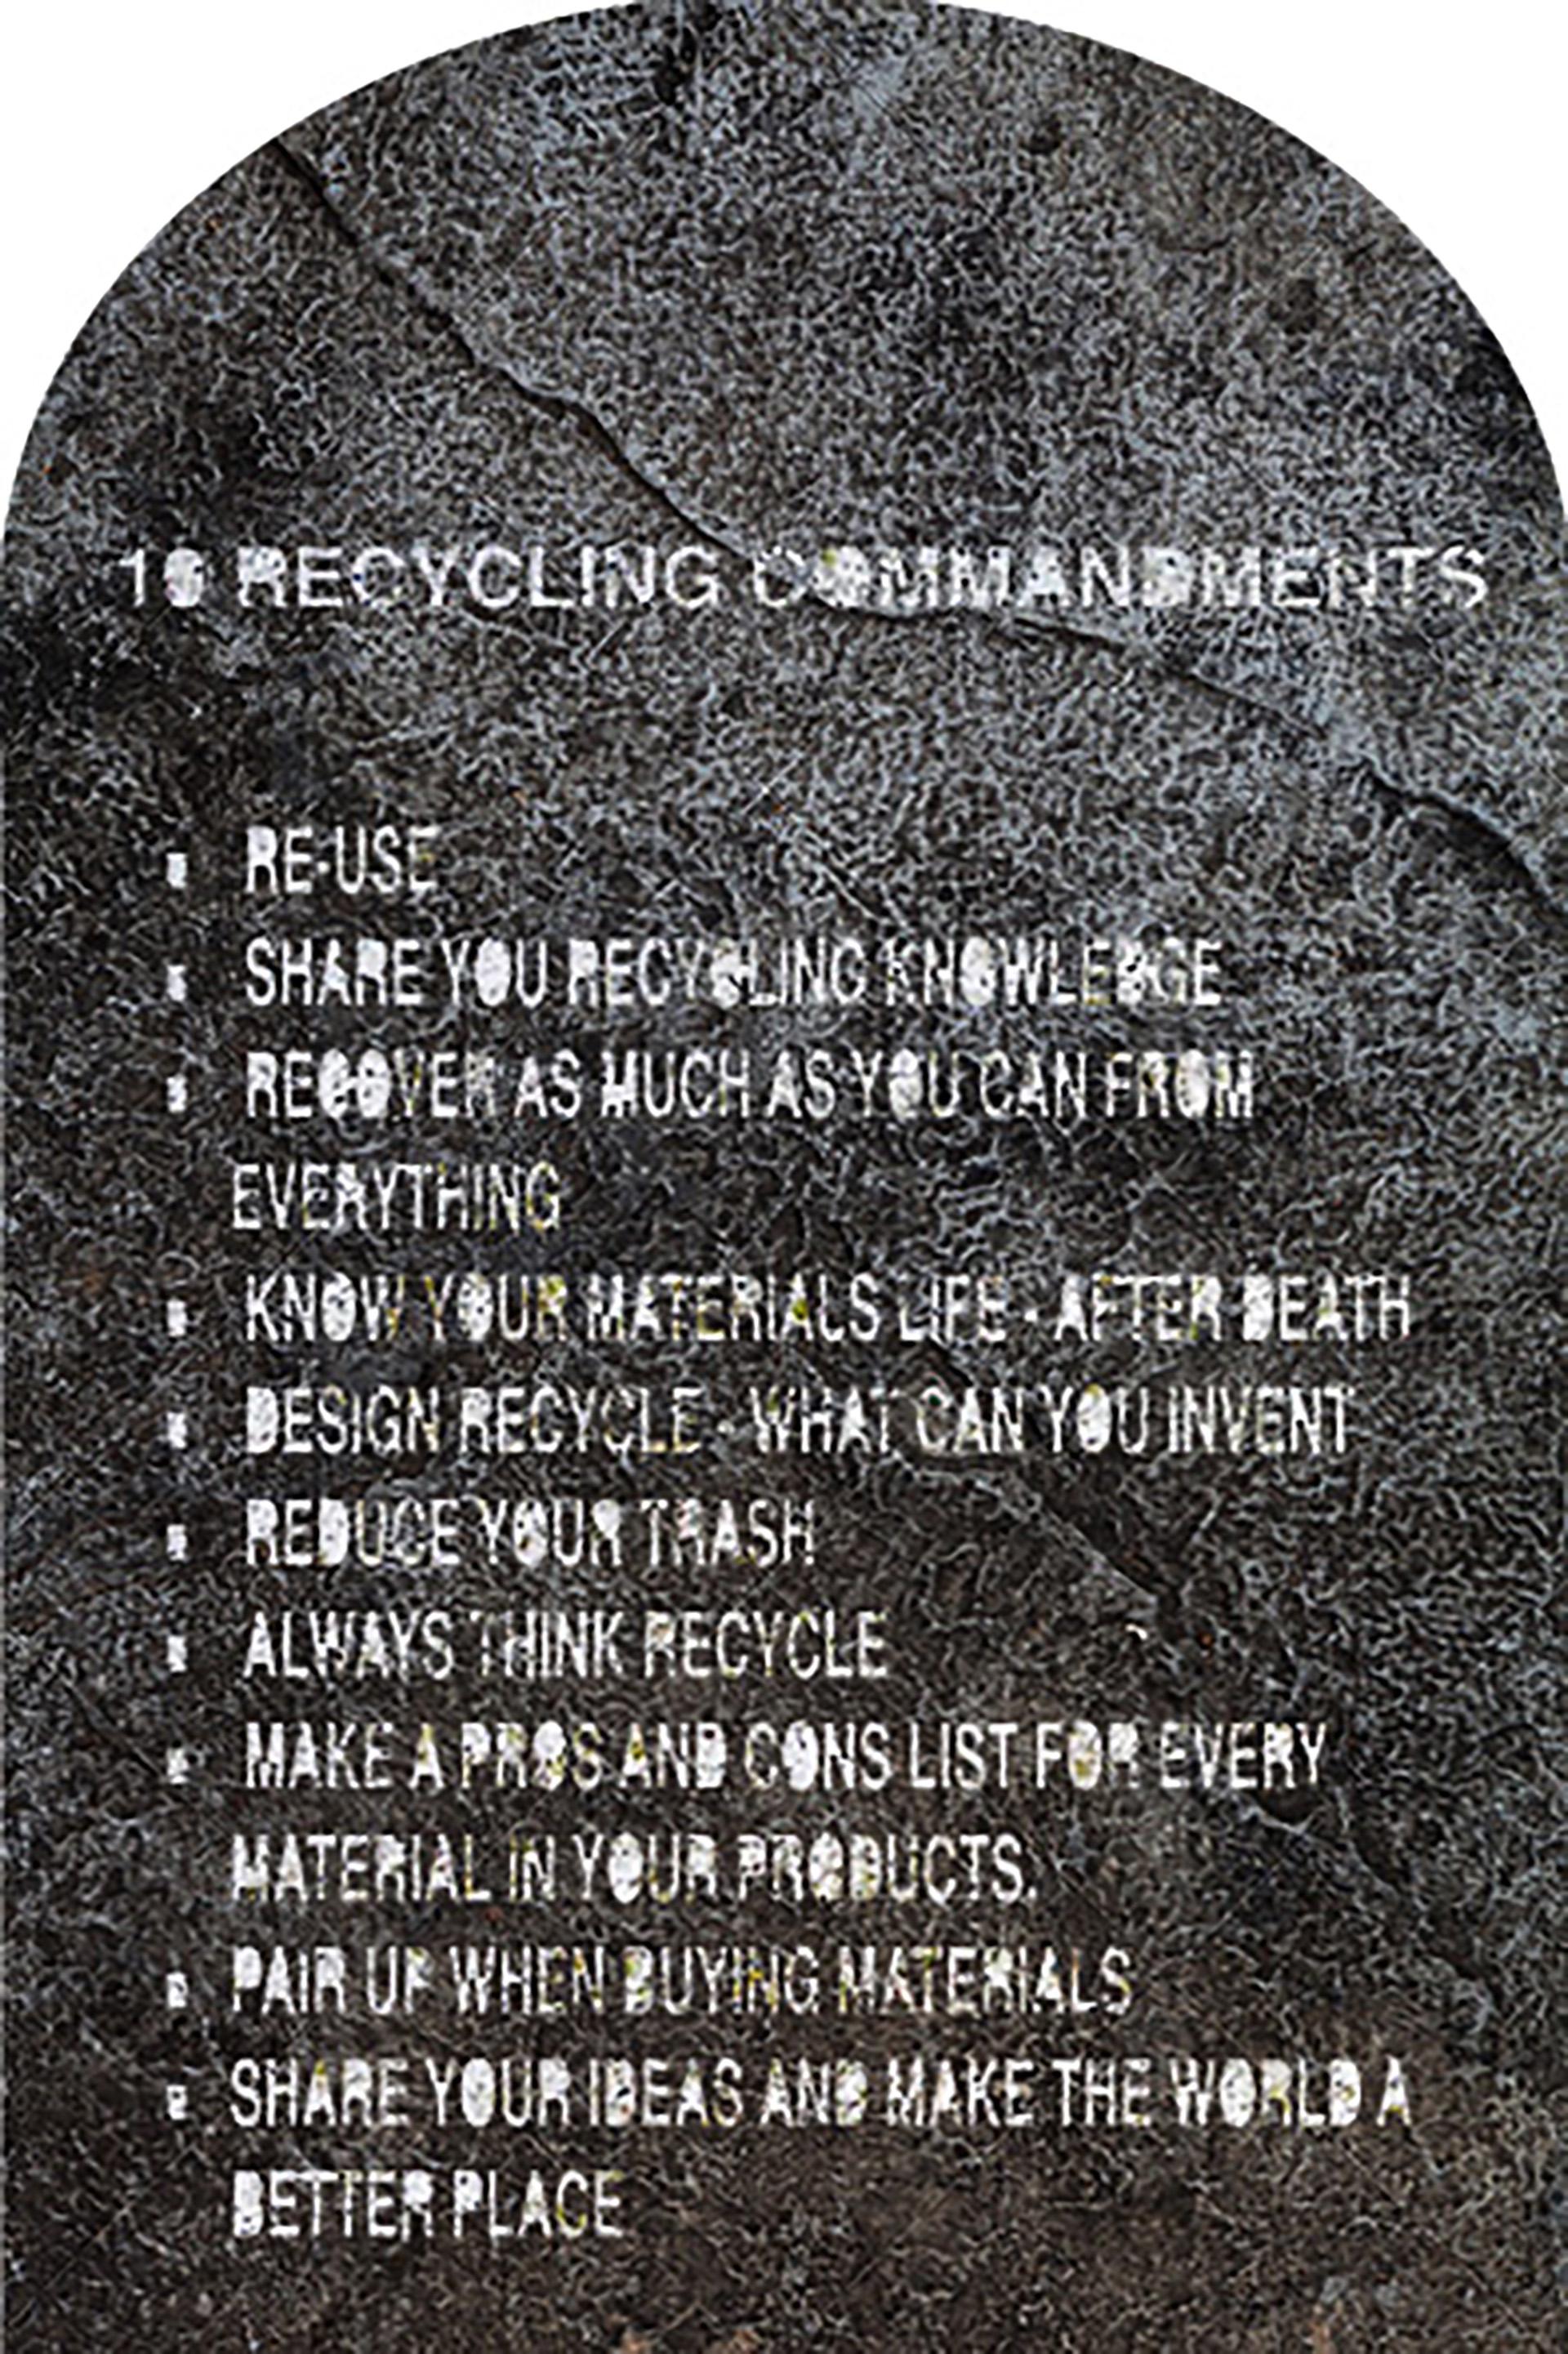 10 RECYCLING COMMANDMENTS.jpg